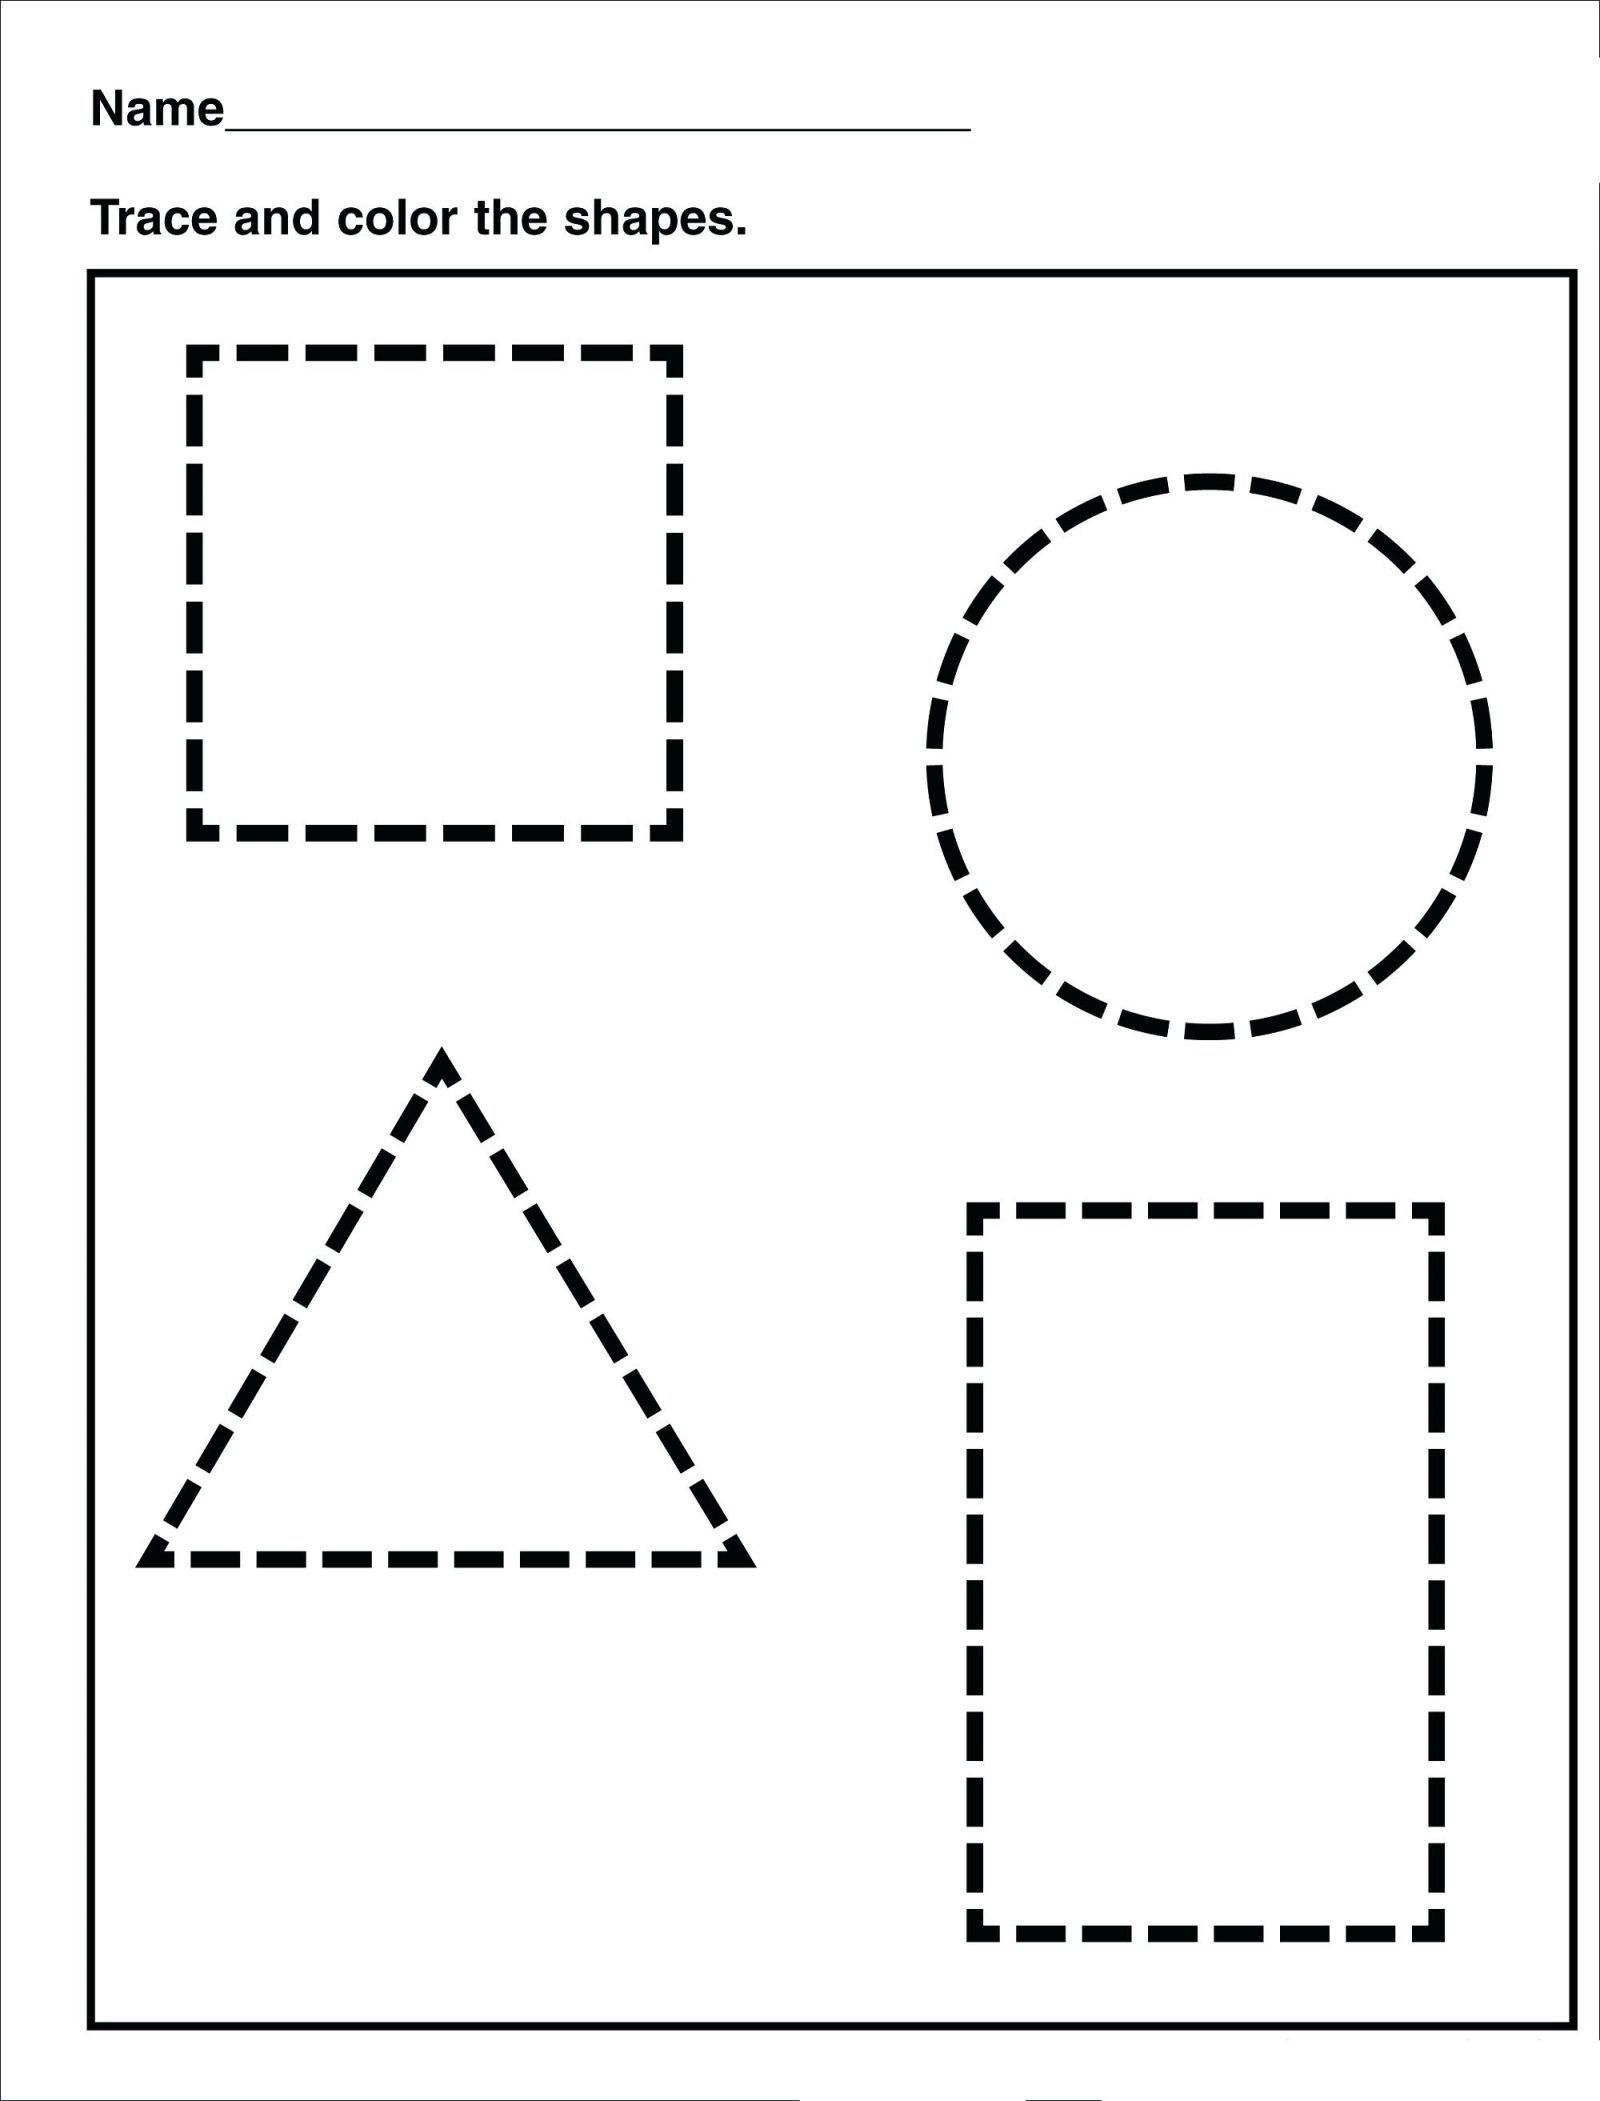 Tracing Shape Tracing Preschool Free Printable